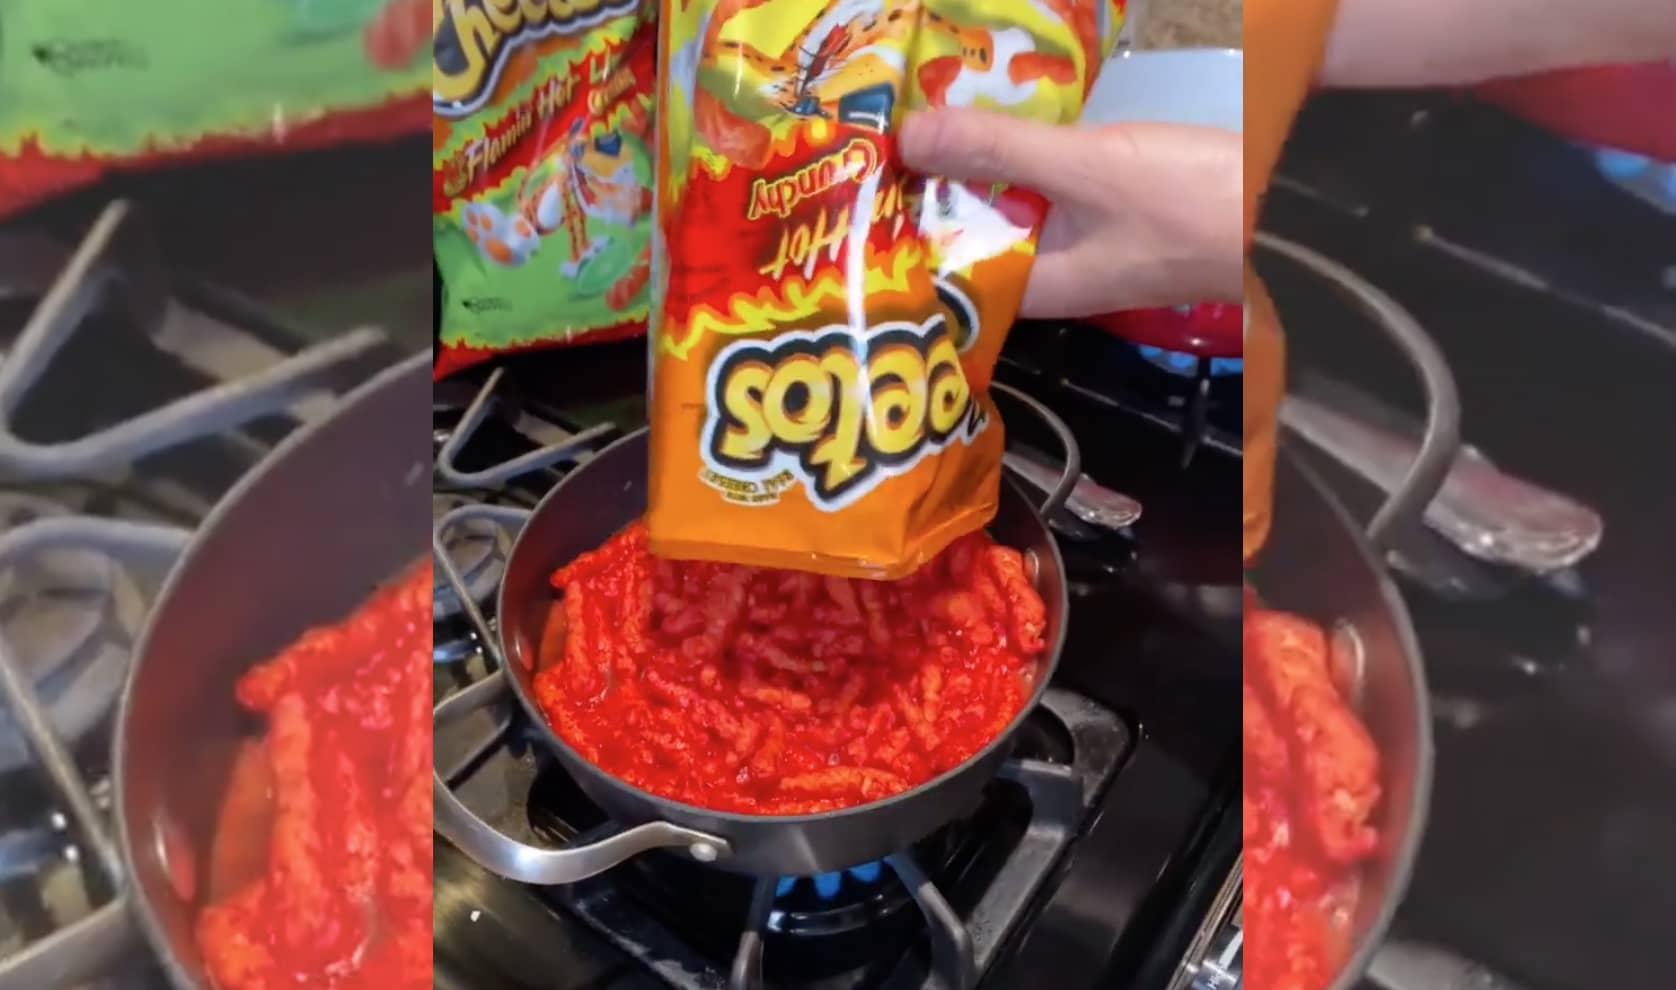 boiling a bag of flaming hot Cheetos